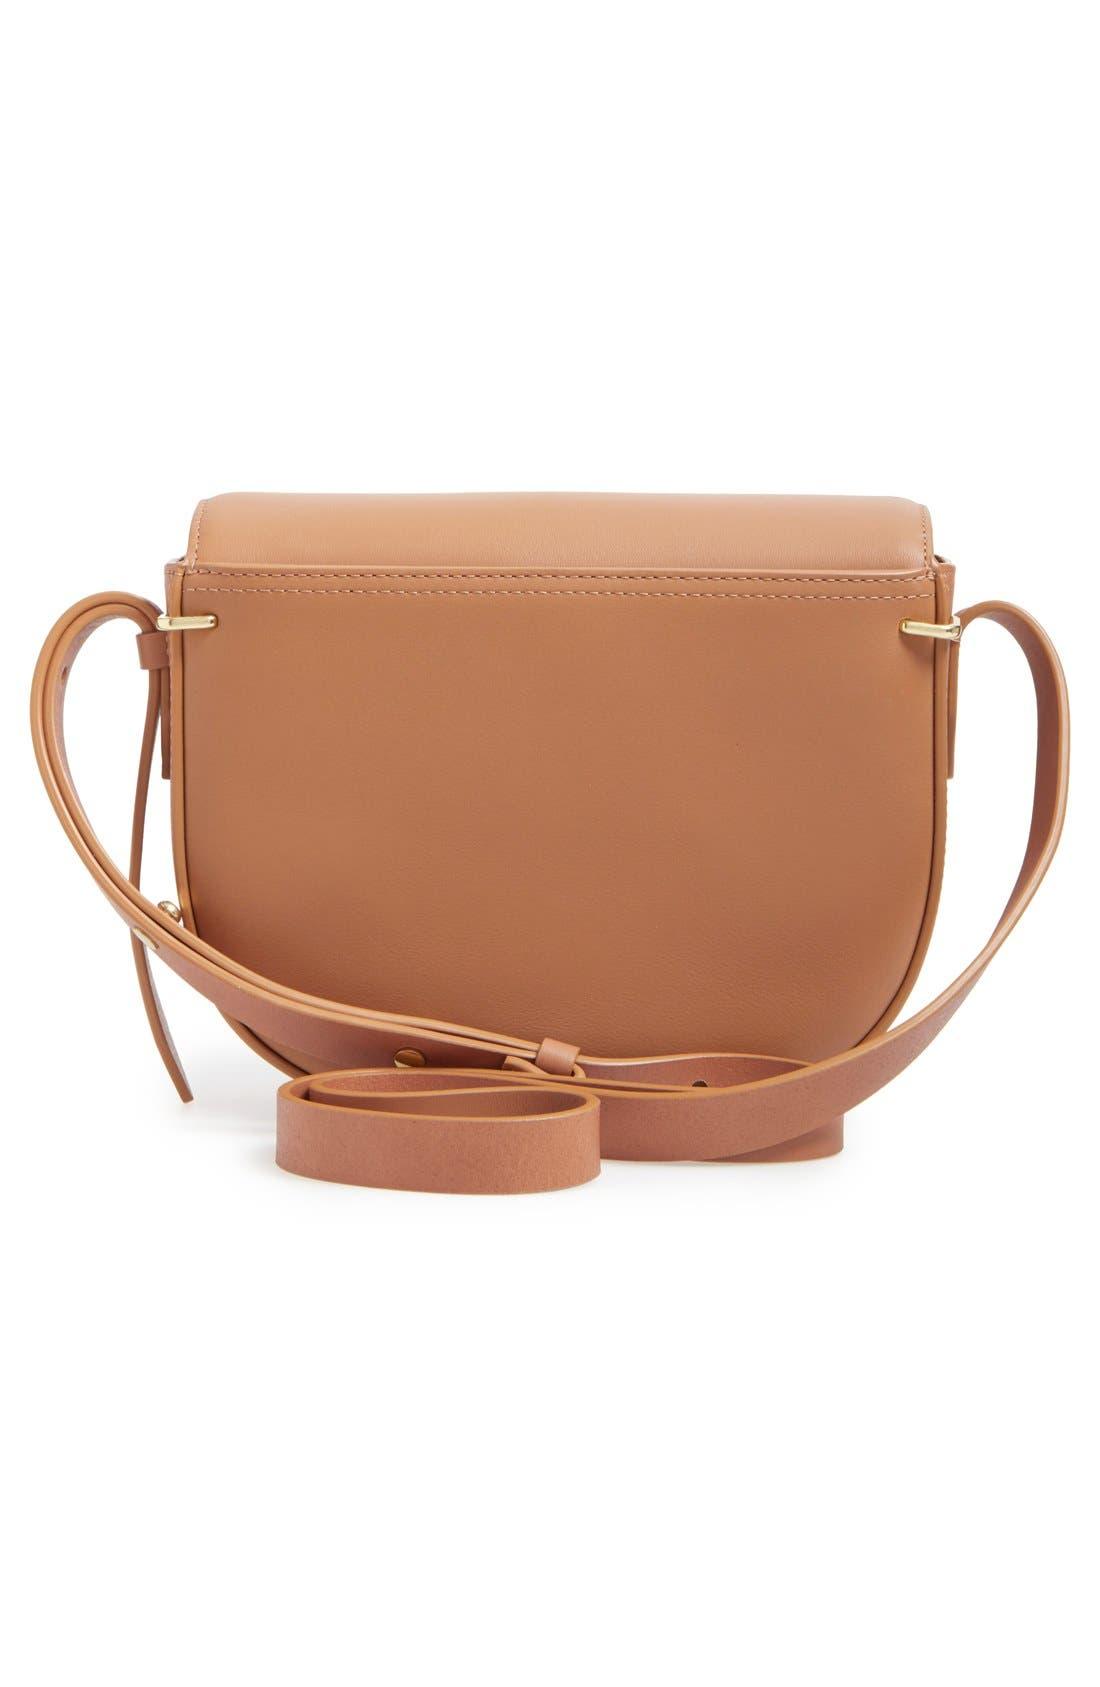 Alix Leather Saddle Bag,                             Alternate thumbnail 11, color,